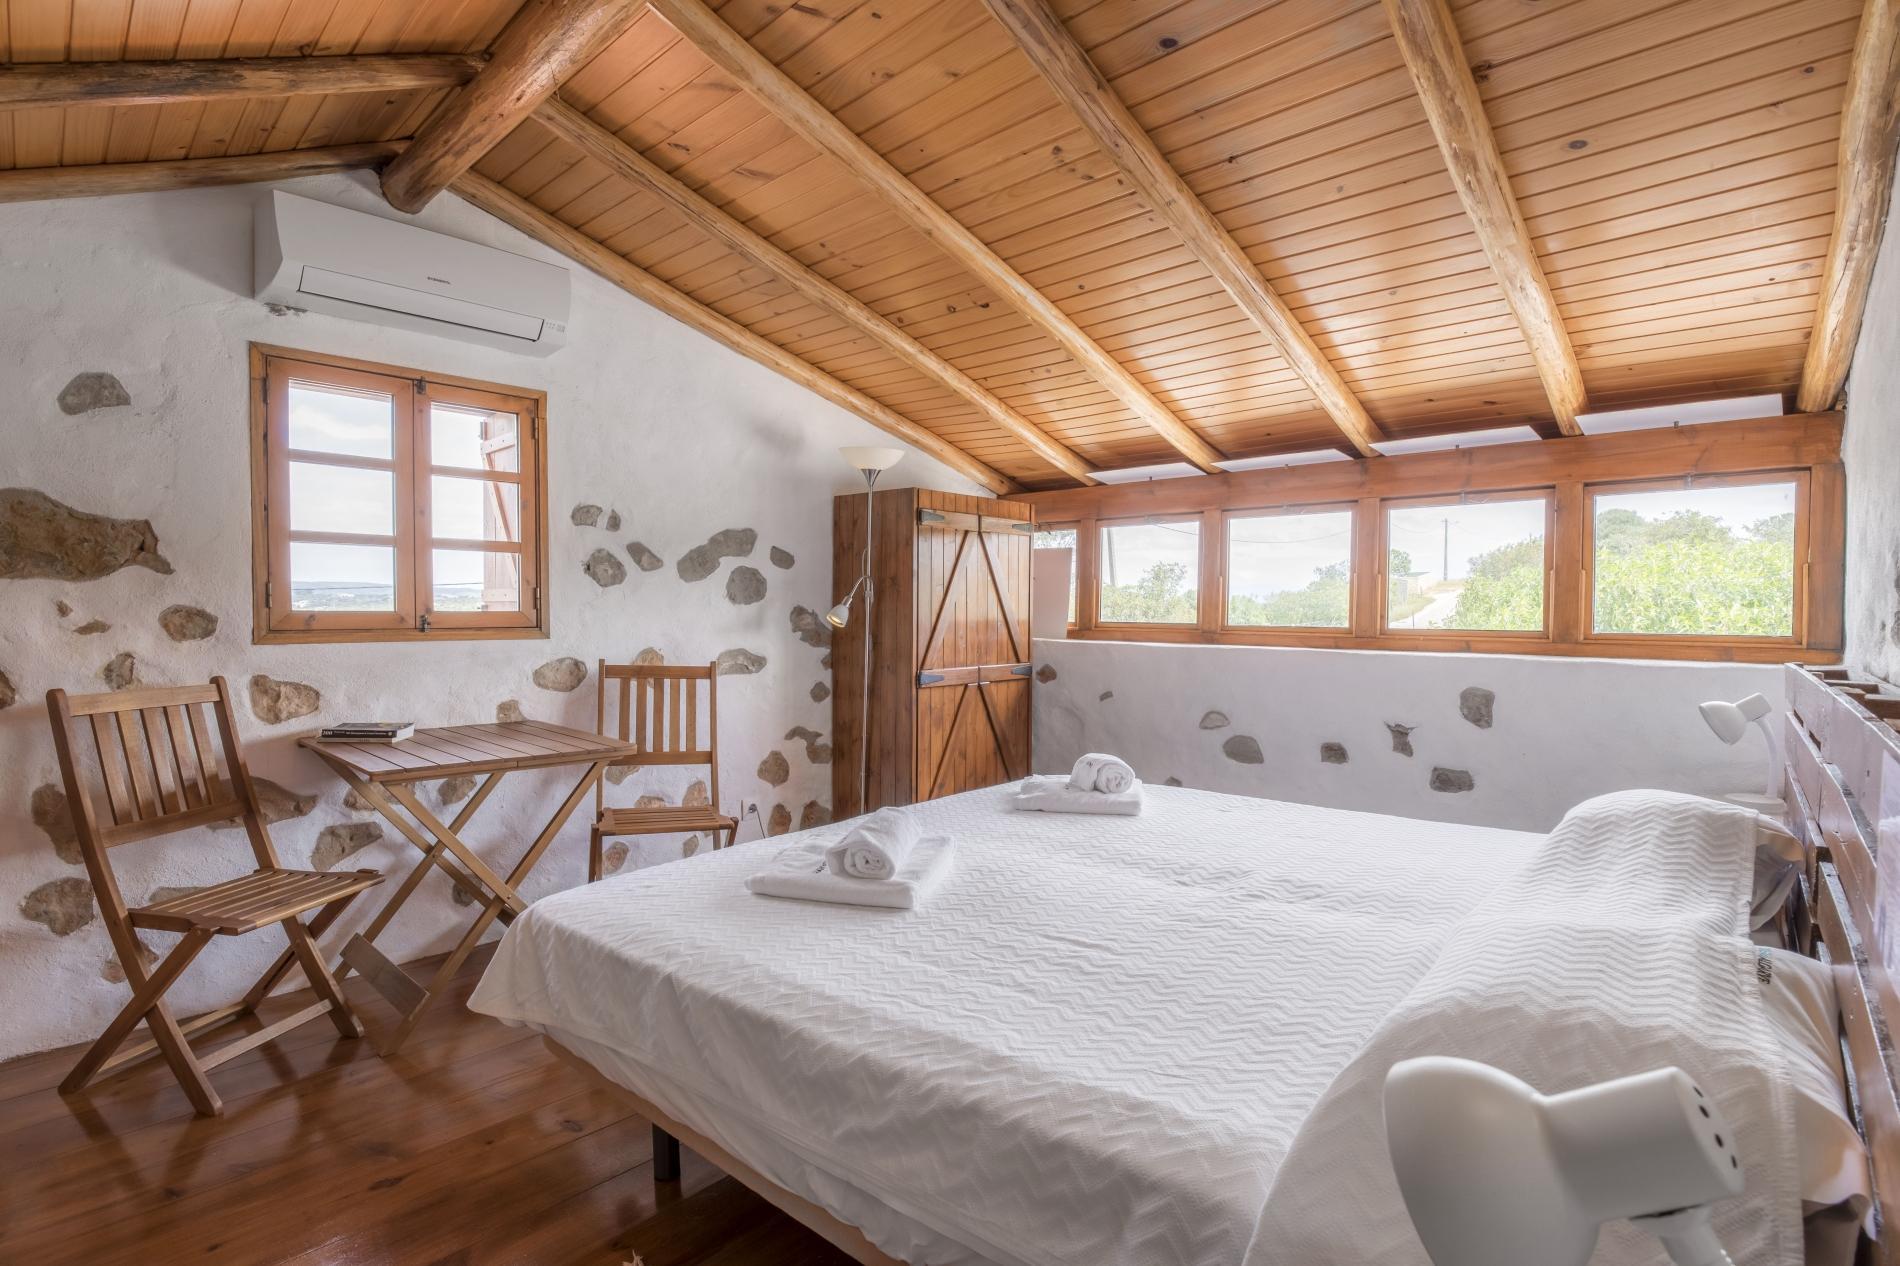 Apartment F - Casa Bezzerinhos in Quinta das Alagoas photo 22522191